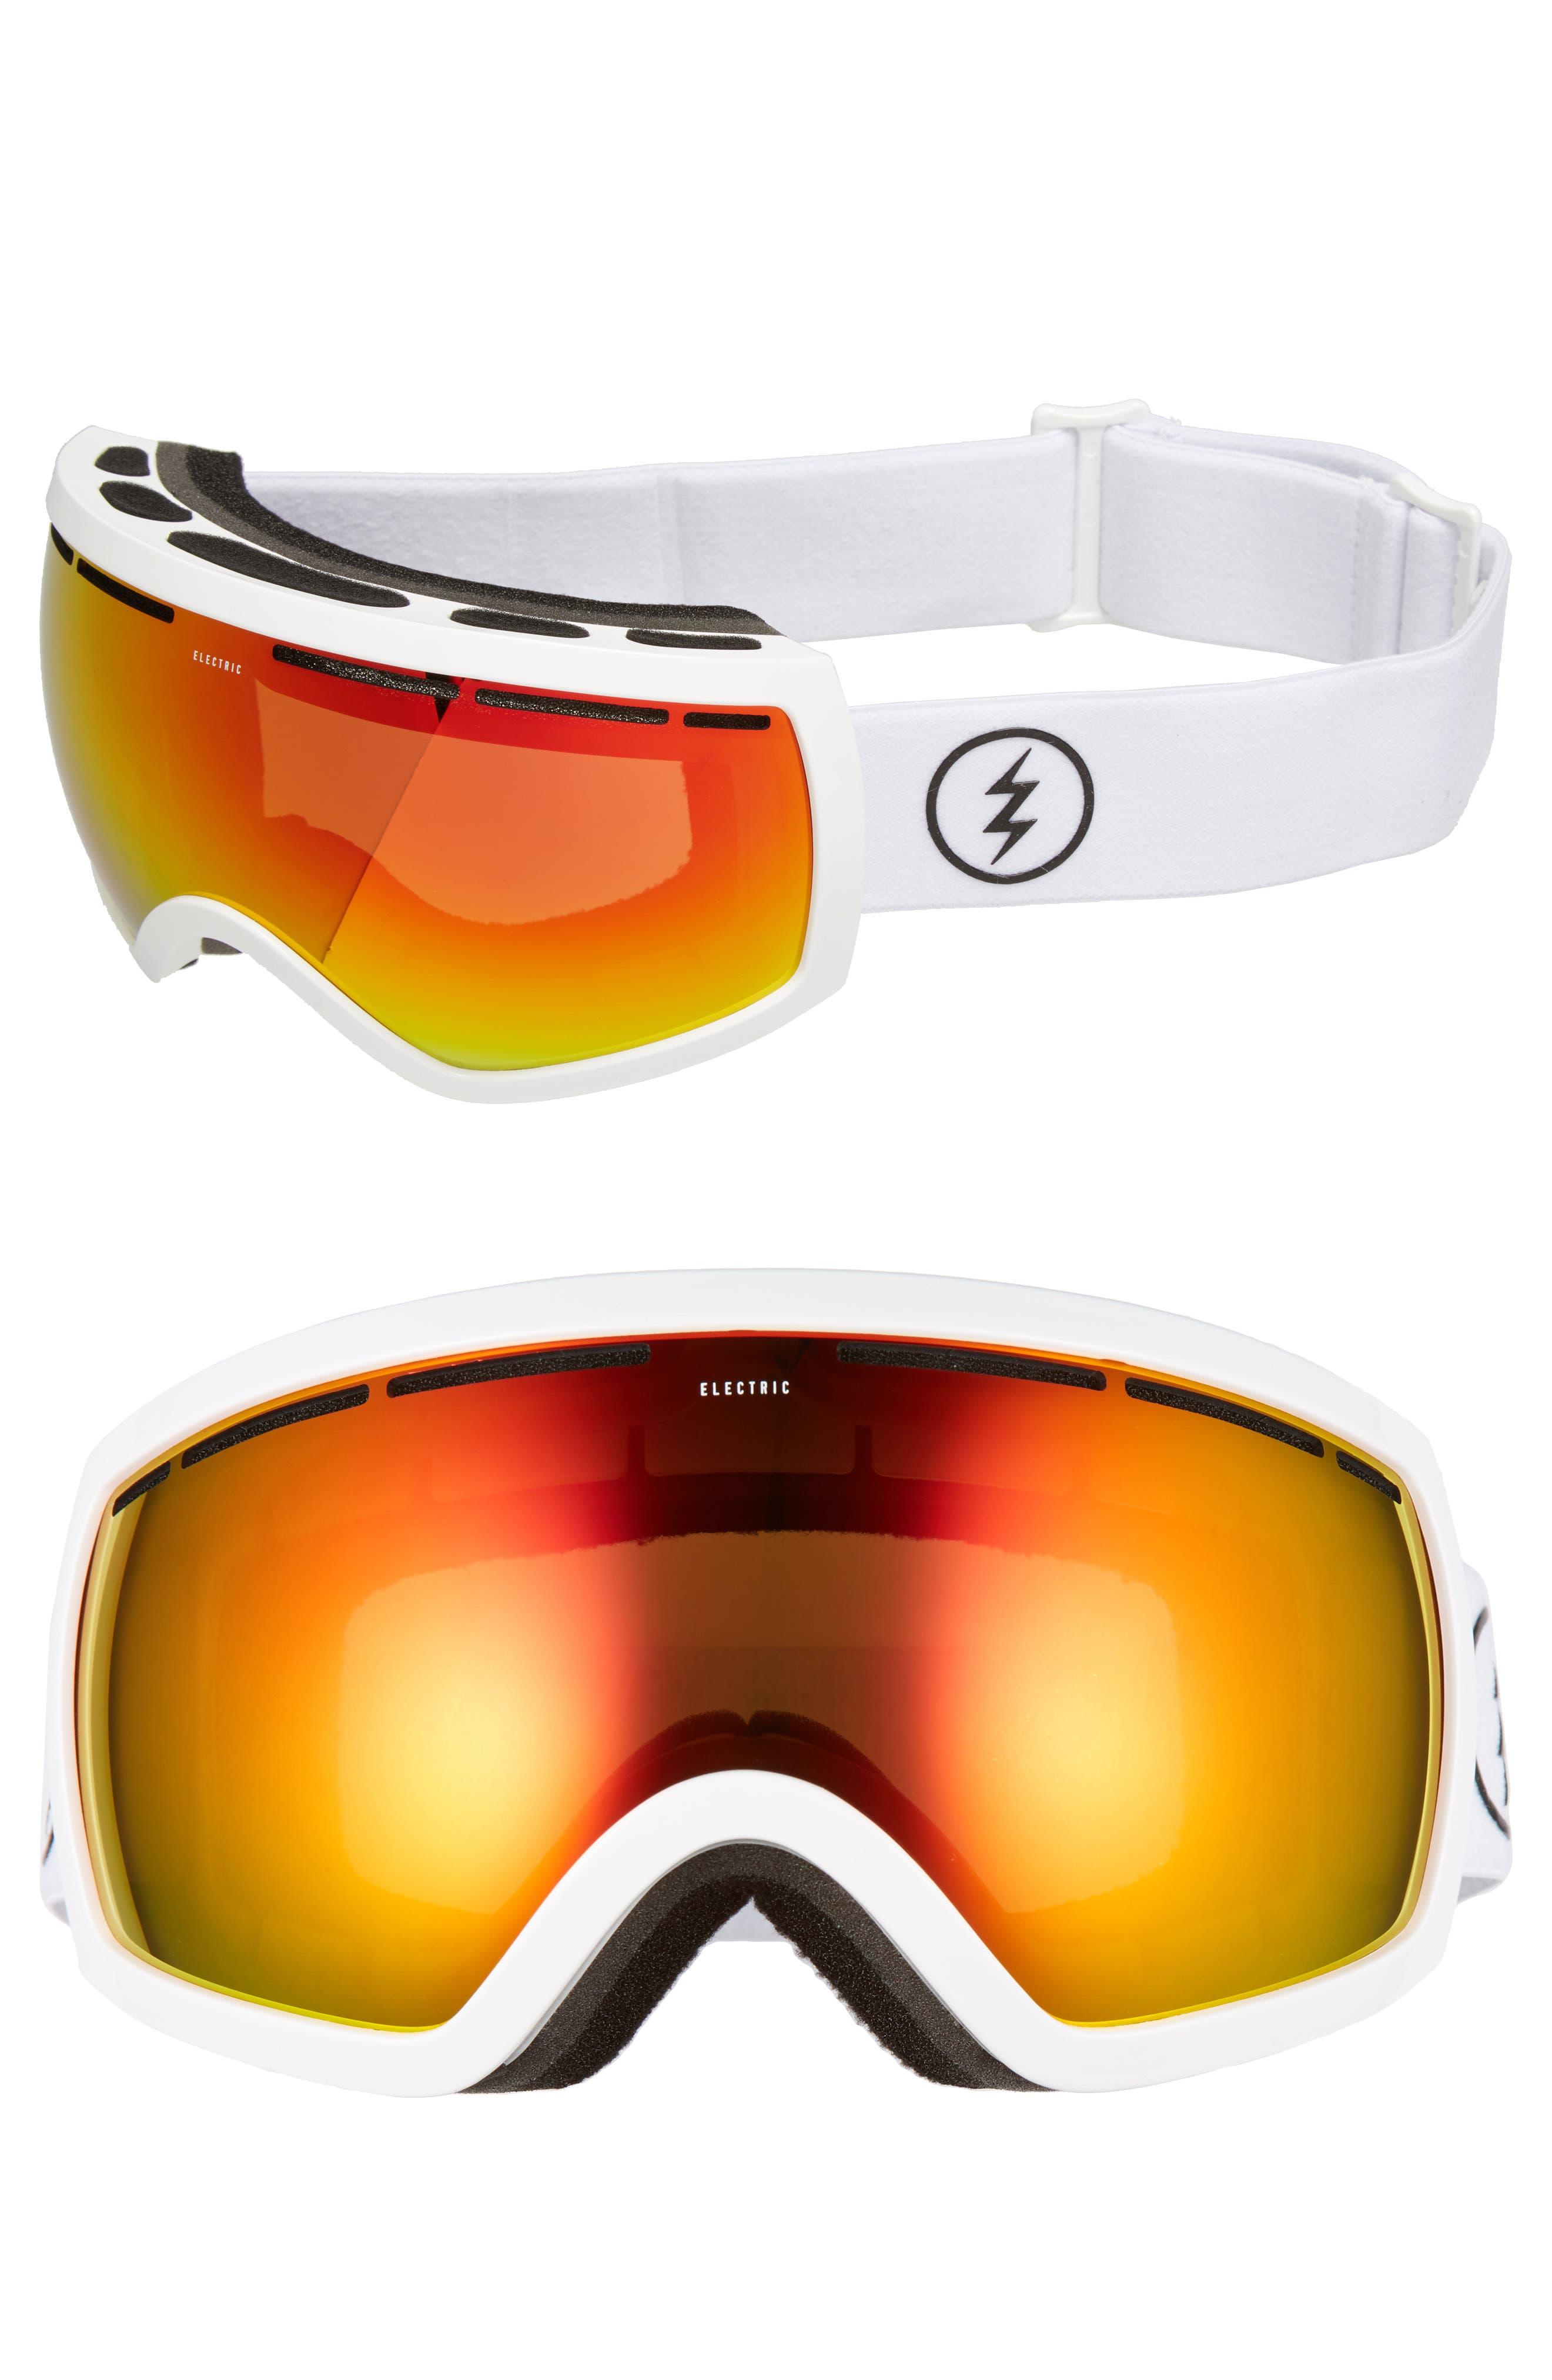 EG 2.5 215mm Snow Goggles,                             Main thumbnail 4, color,